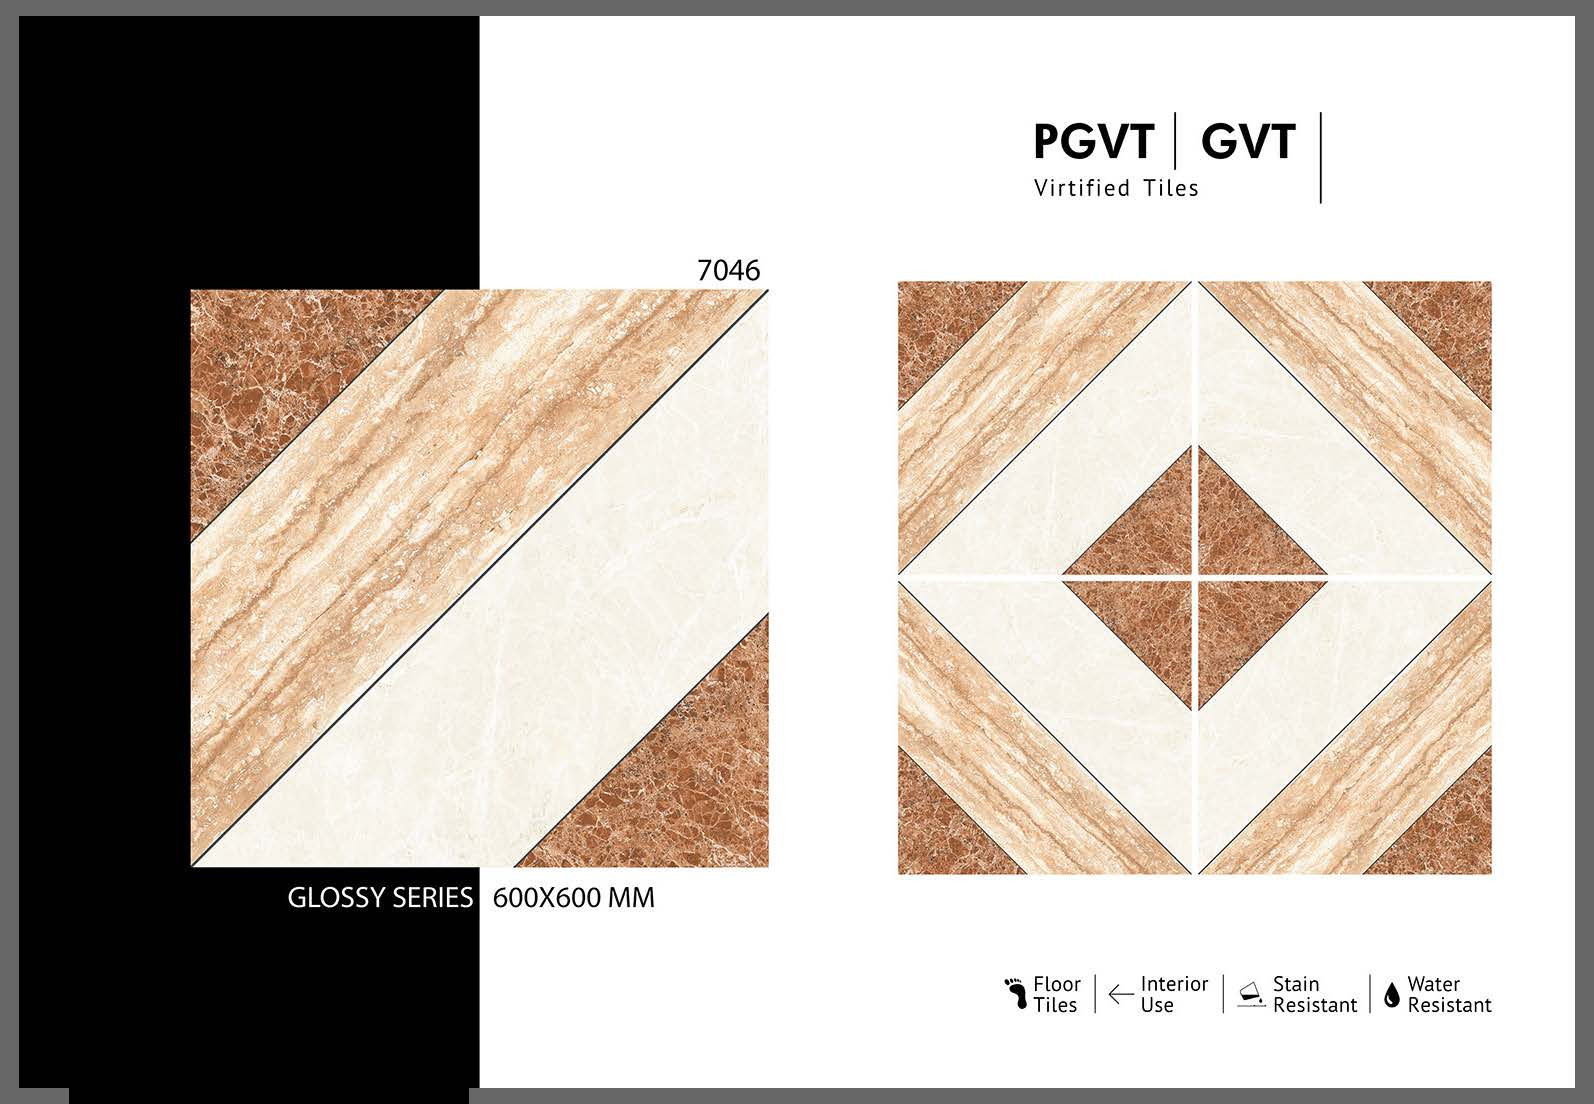 GVT 2X2 GLOSSY_Page_35.jpg